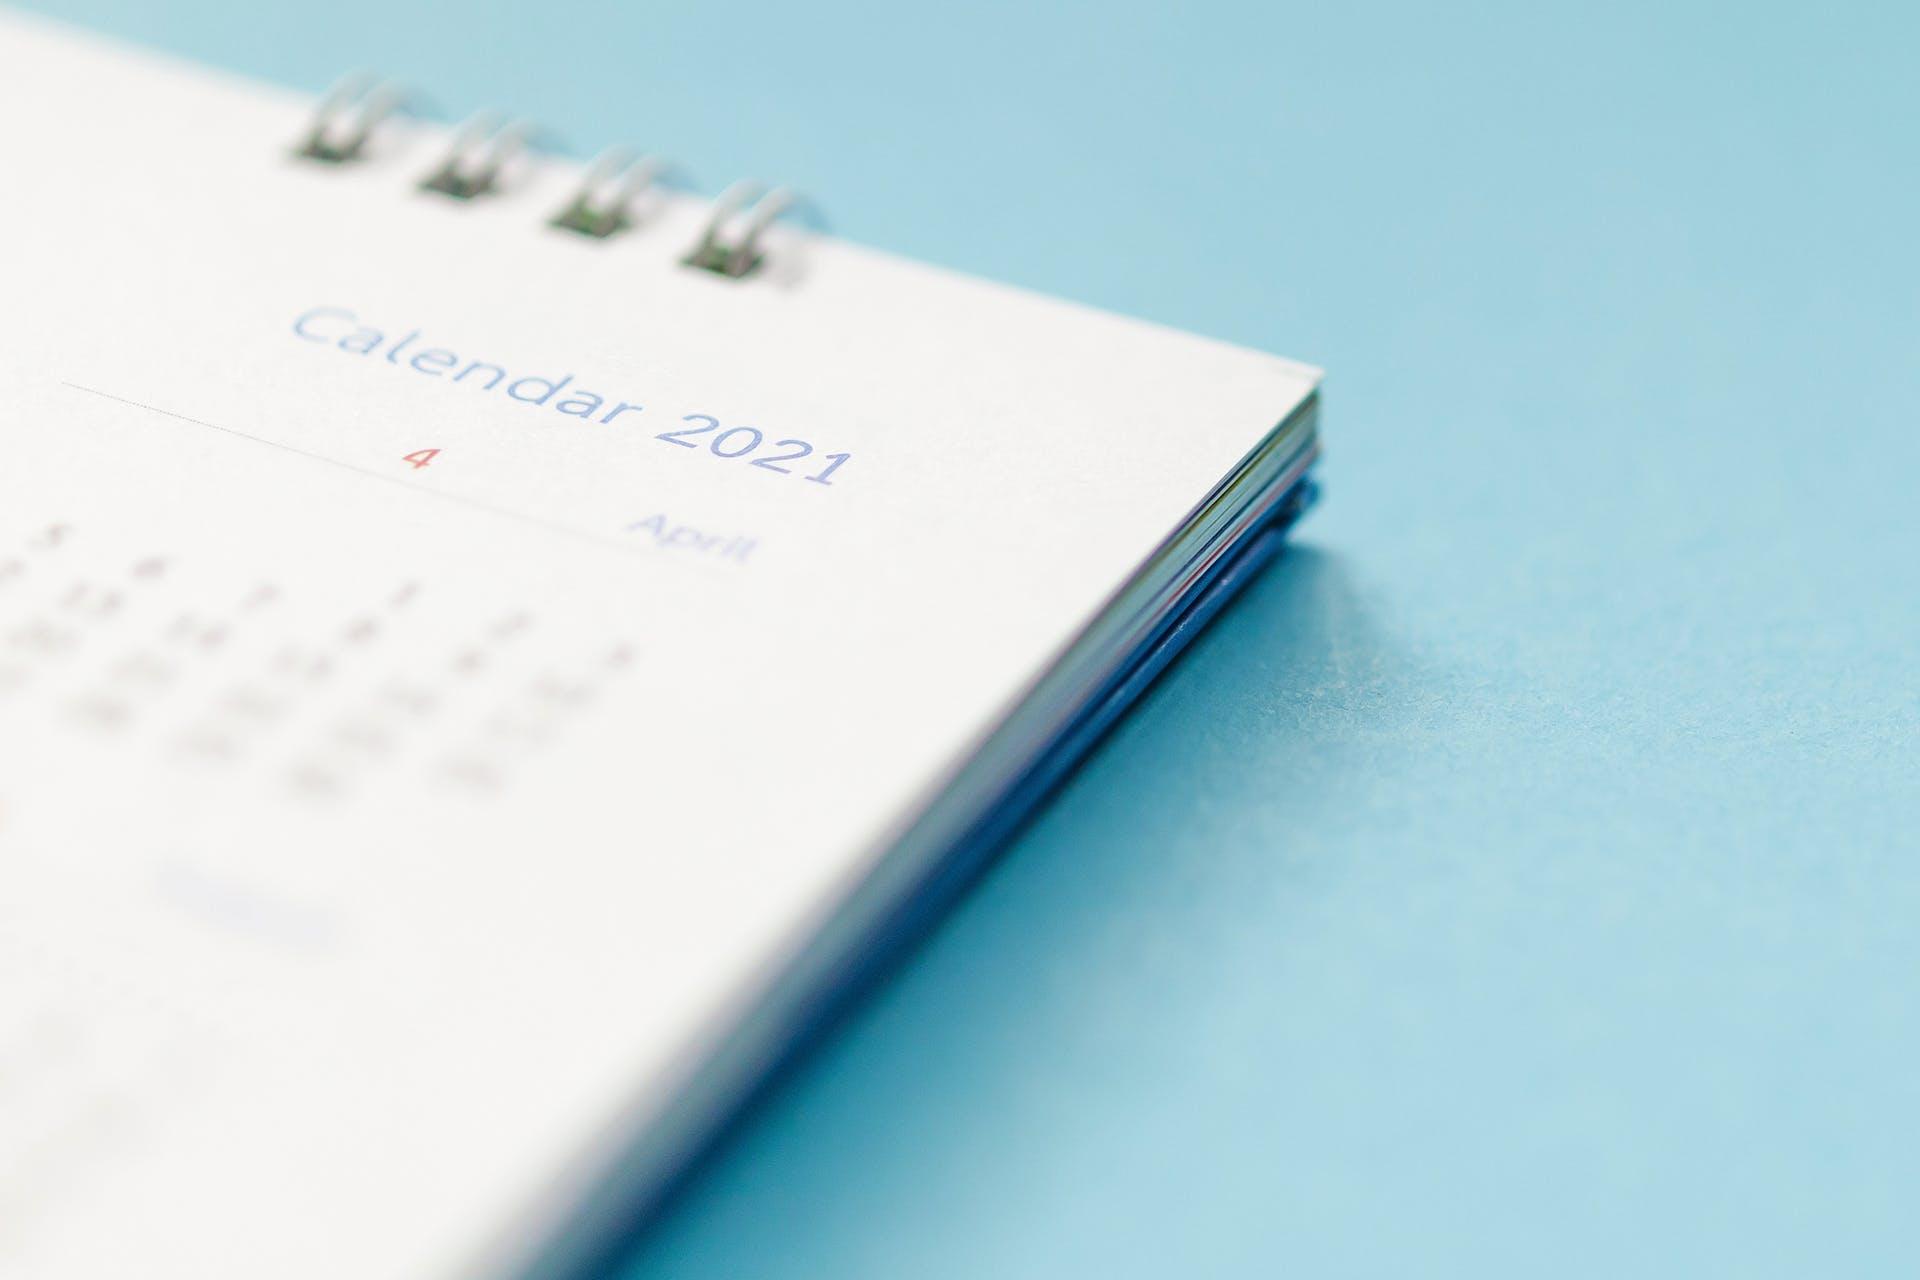 National Days calendar for 2021